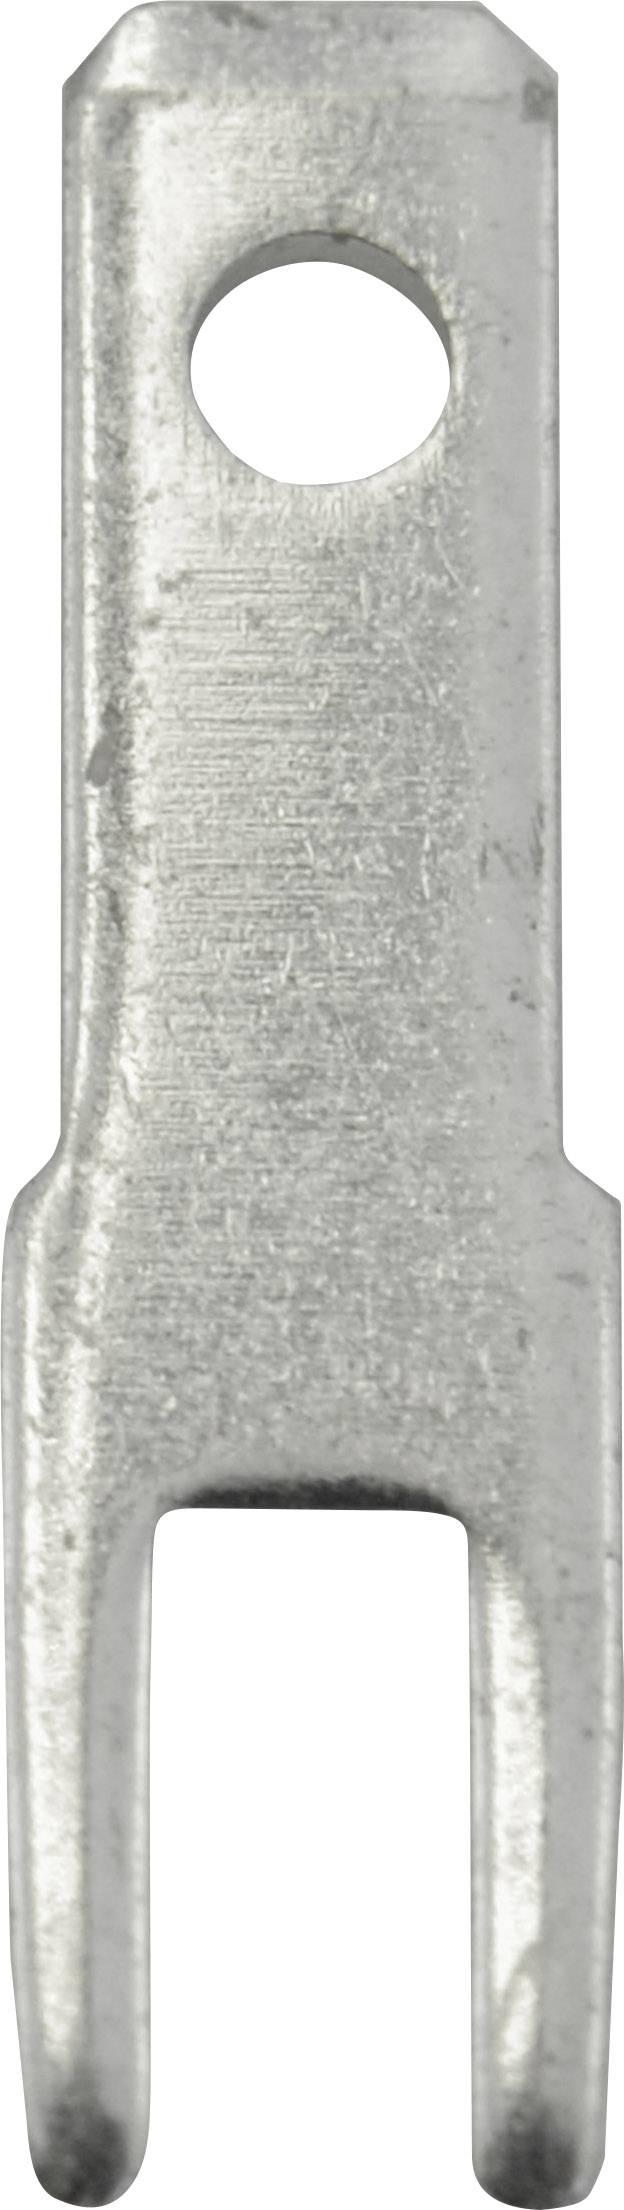 Faston zástrčka Vogt Verbindungstechnik 3785a05.68 2.8 mm x 0.5 mm, 180 °, bez izolace, kov, 100 ks